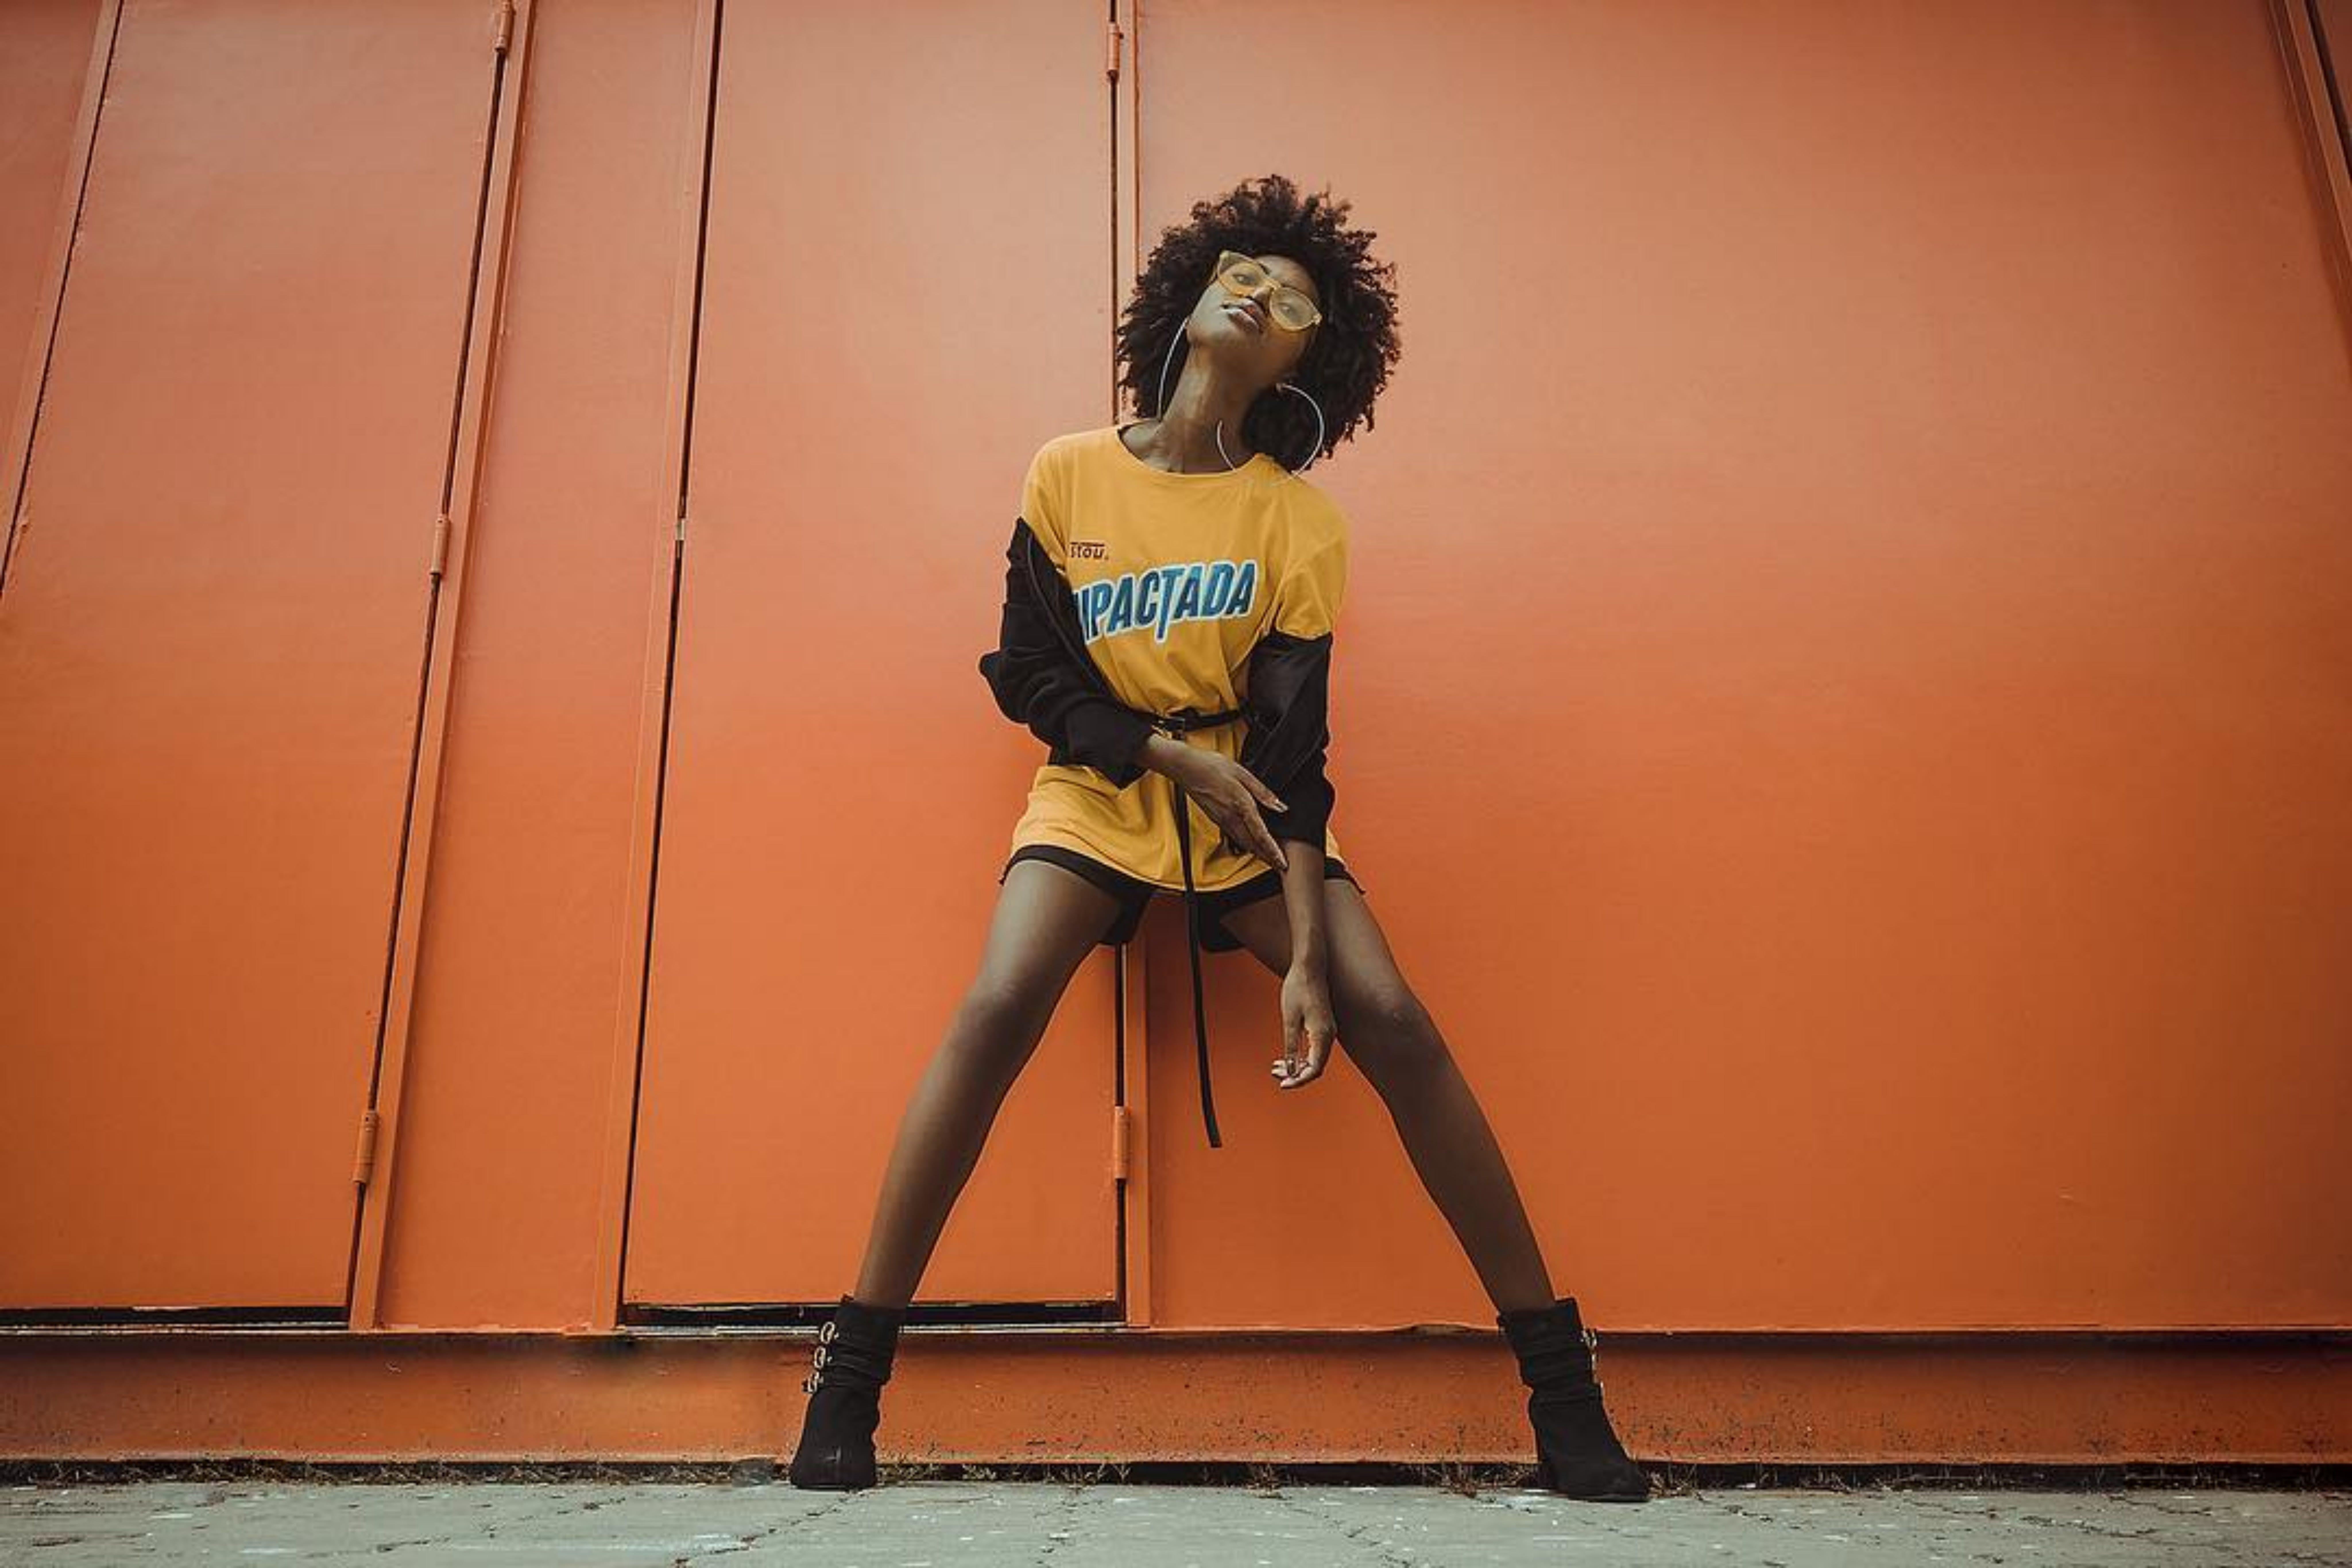 Woman in Yellow Shirt Standing Beside Orange Wall